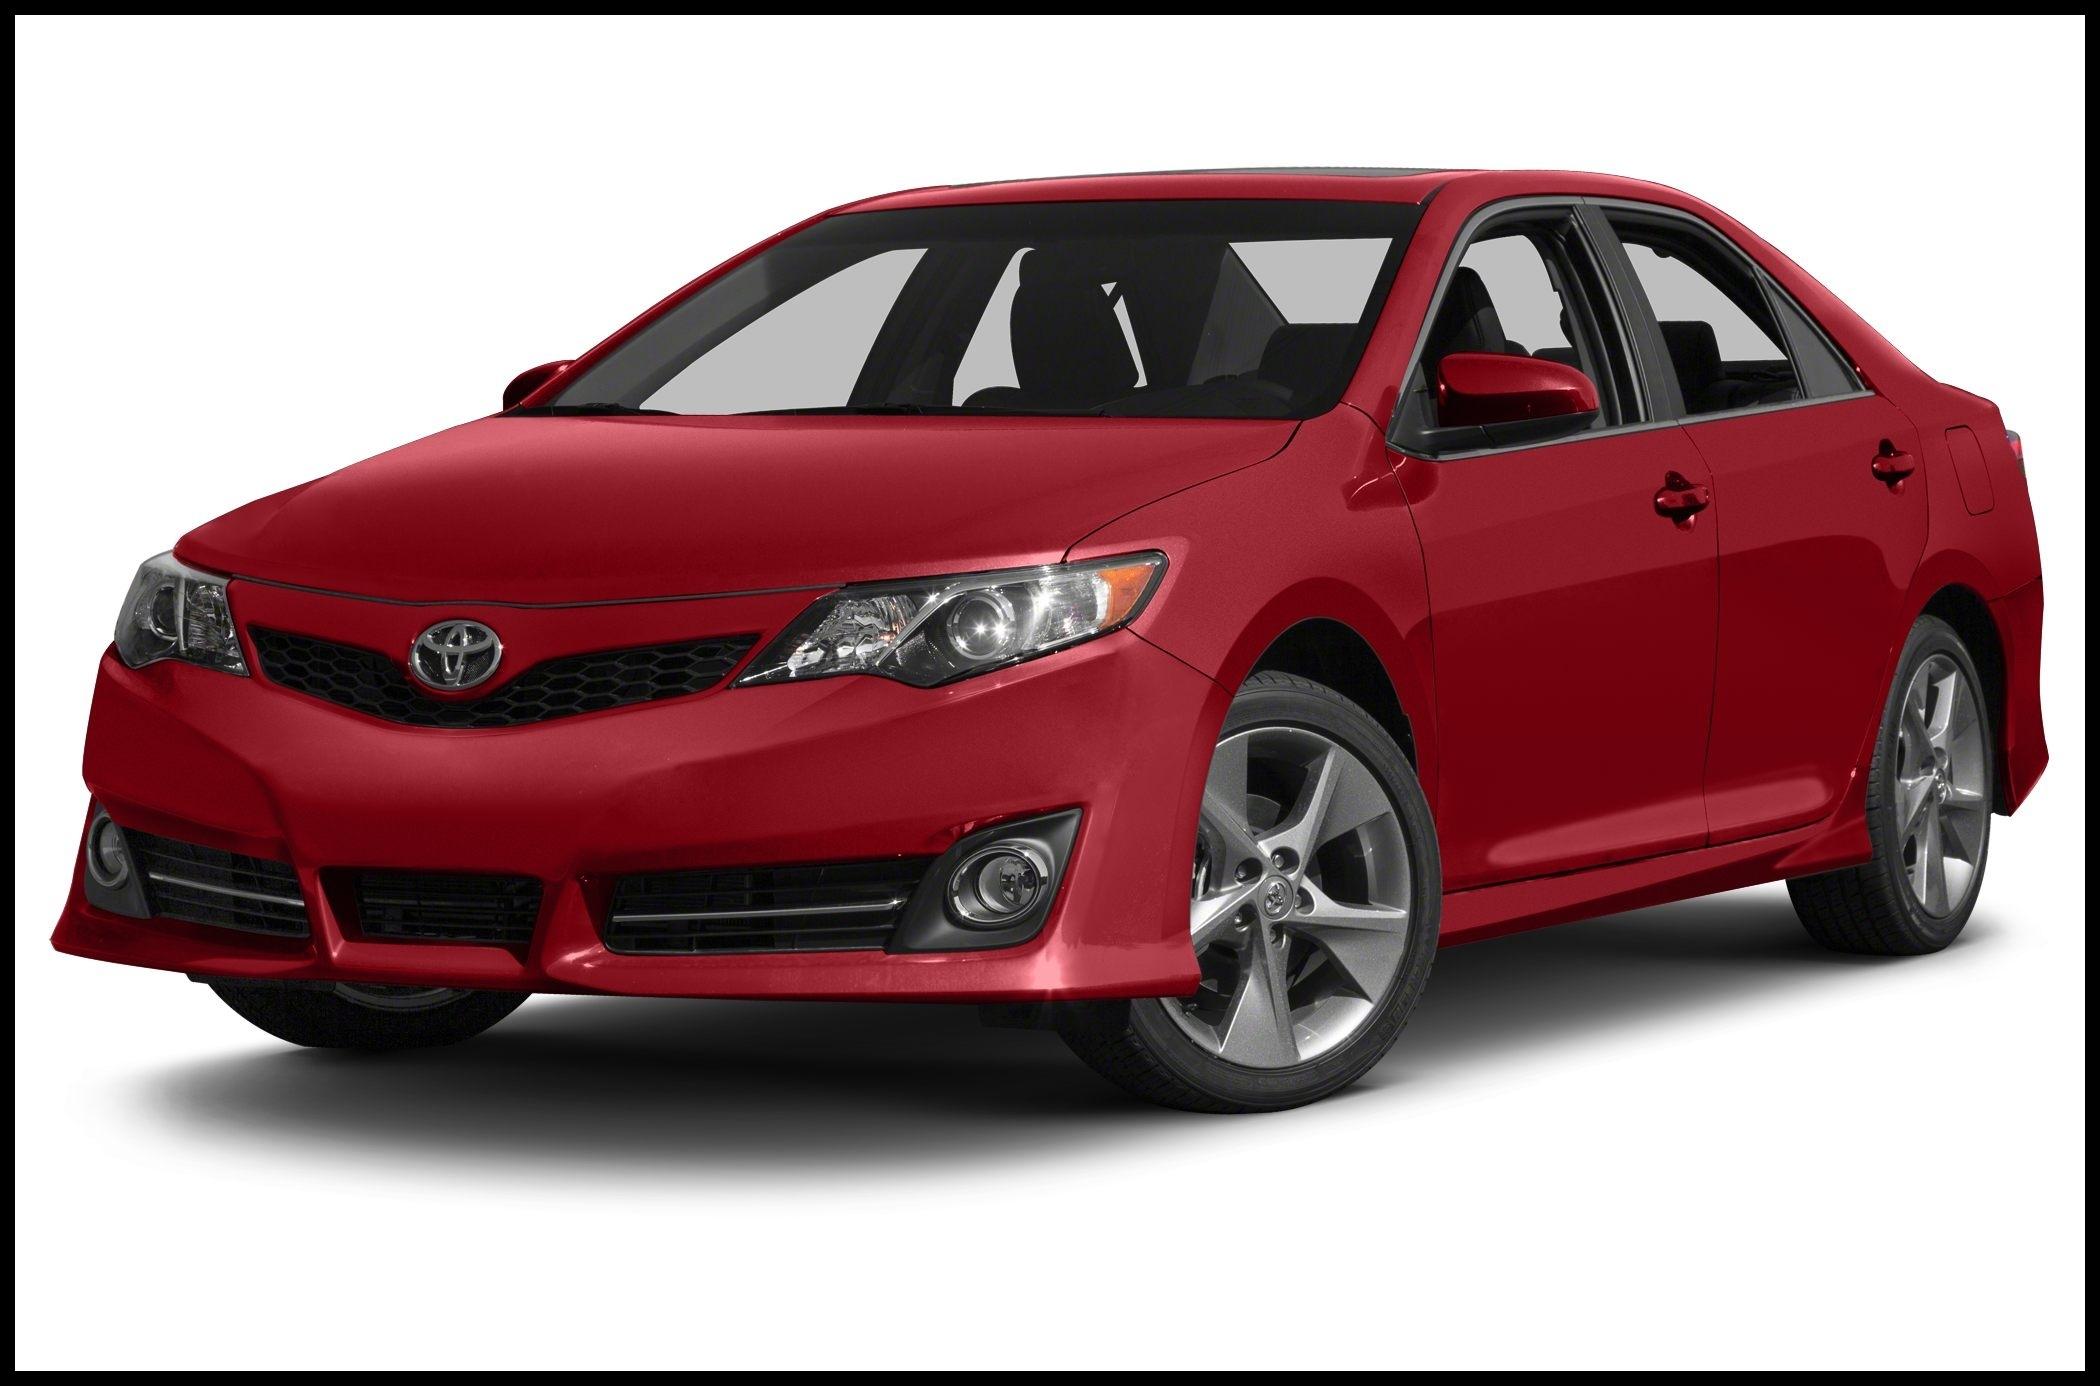 Toyota Interior Color Codes Best 2014 toyota Camry Se Sport 4dr Sedan ·